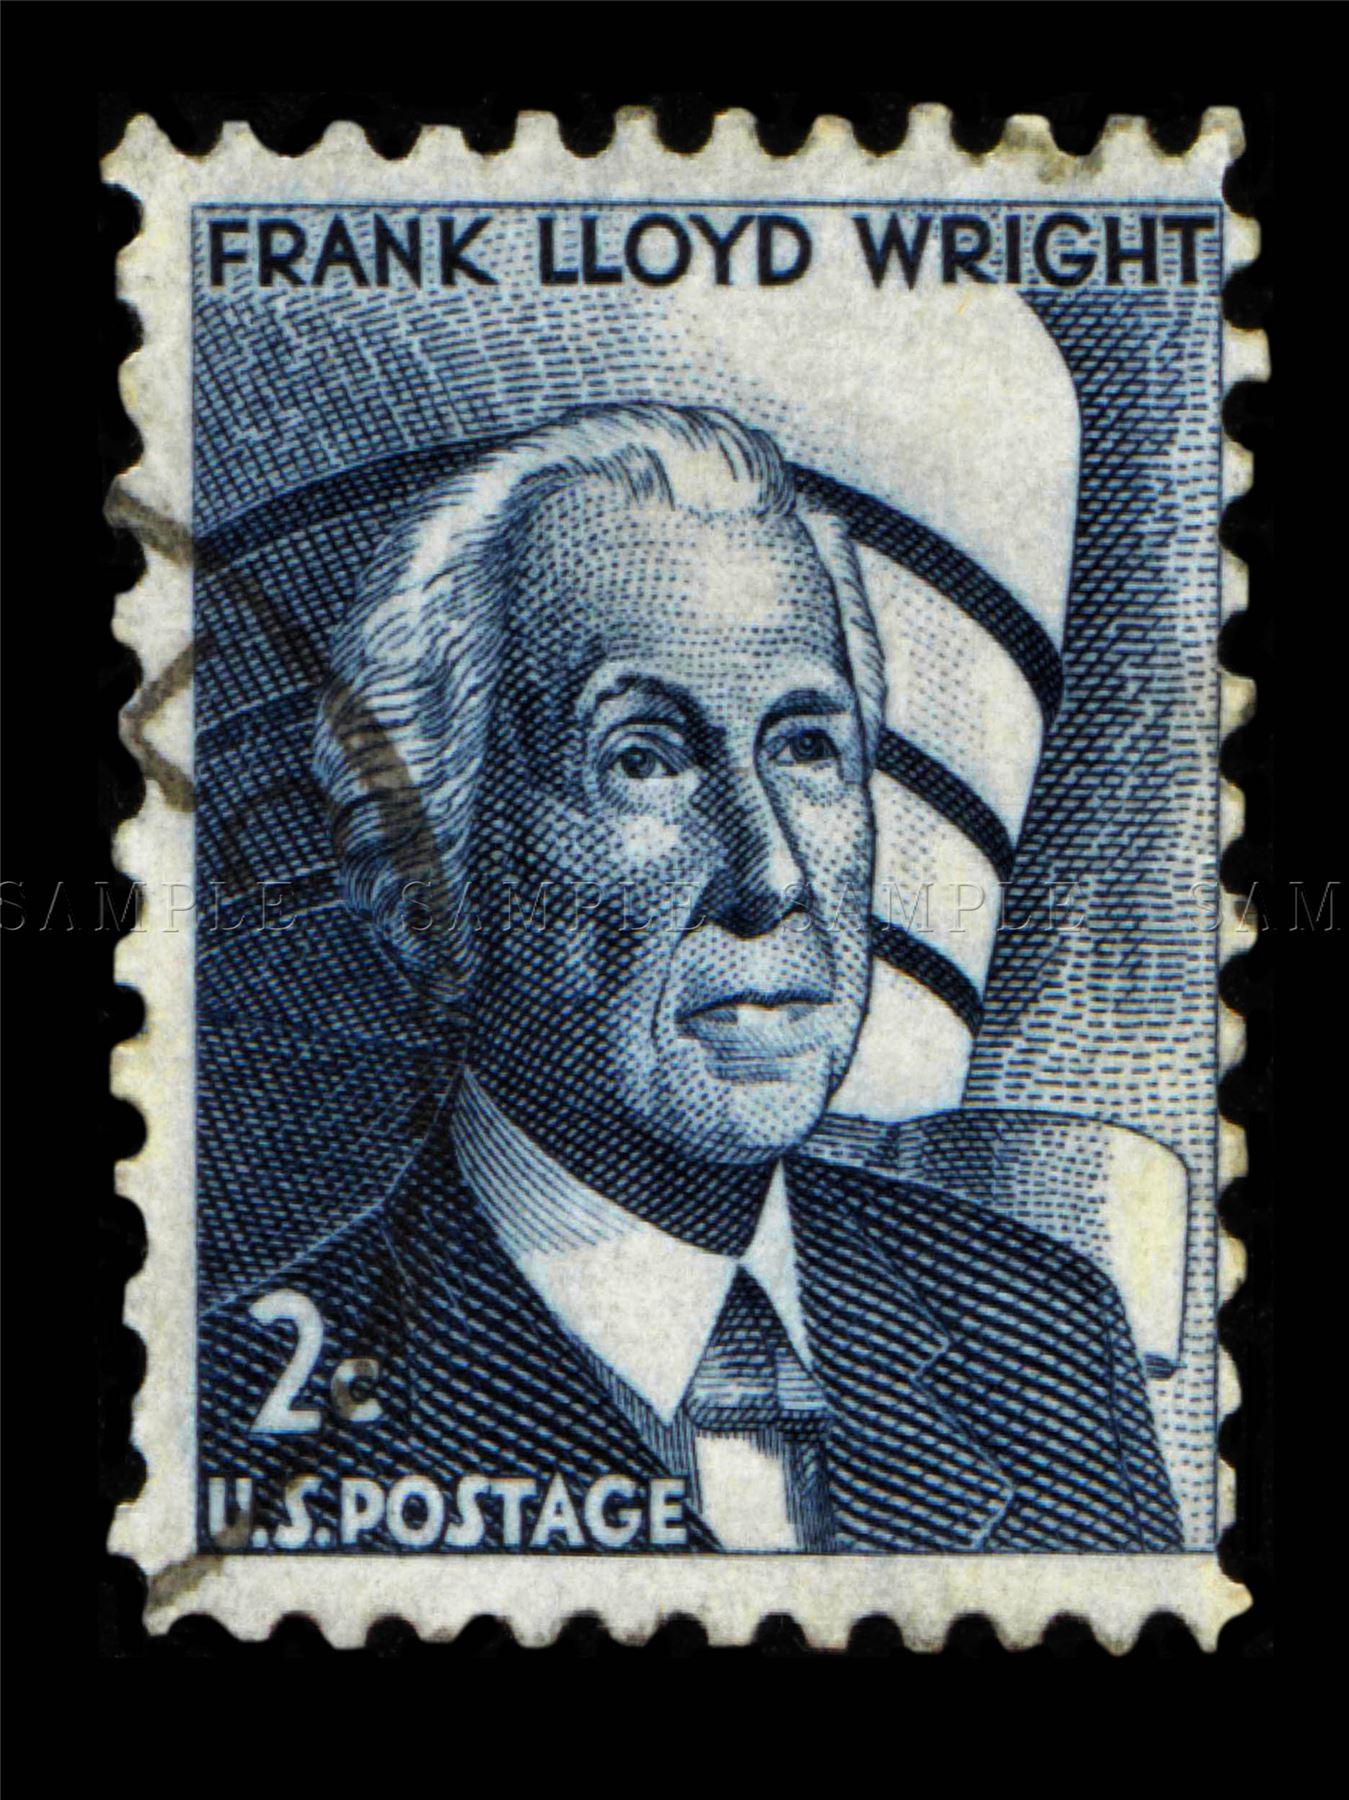 frank lloyd wright vintage stamp photo art print poster picture bmp726a ebay. Black Bedroom Furniture Sets. Home Design Ideas